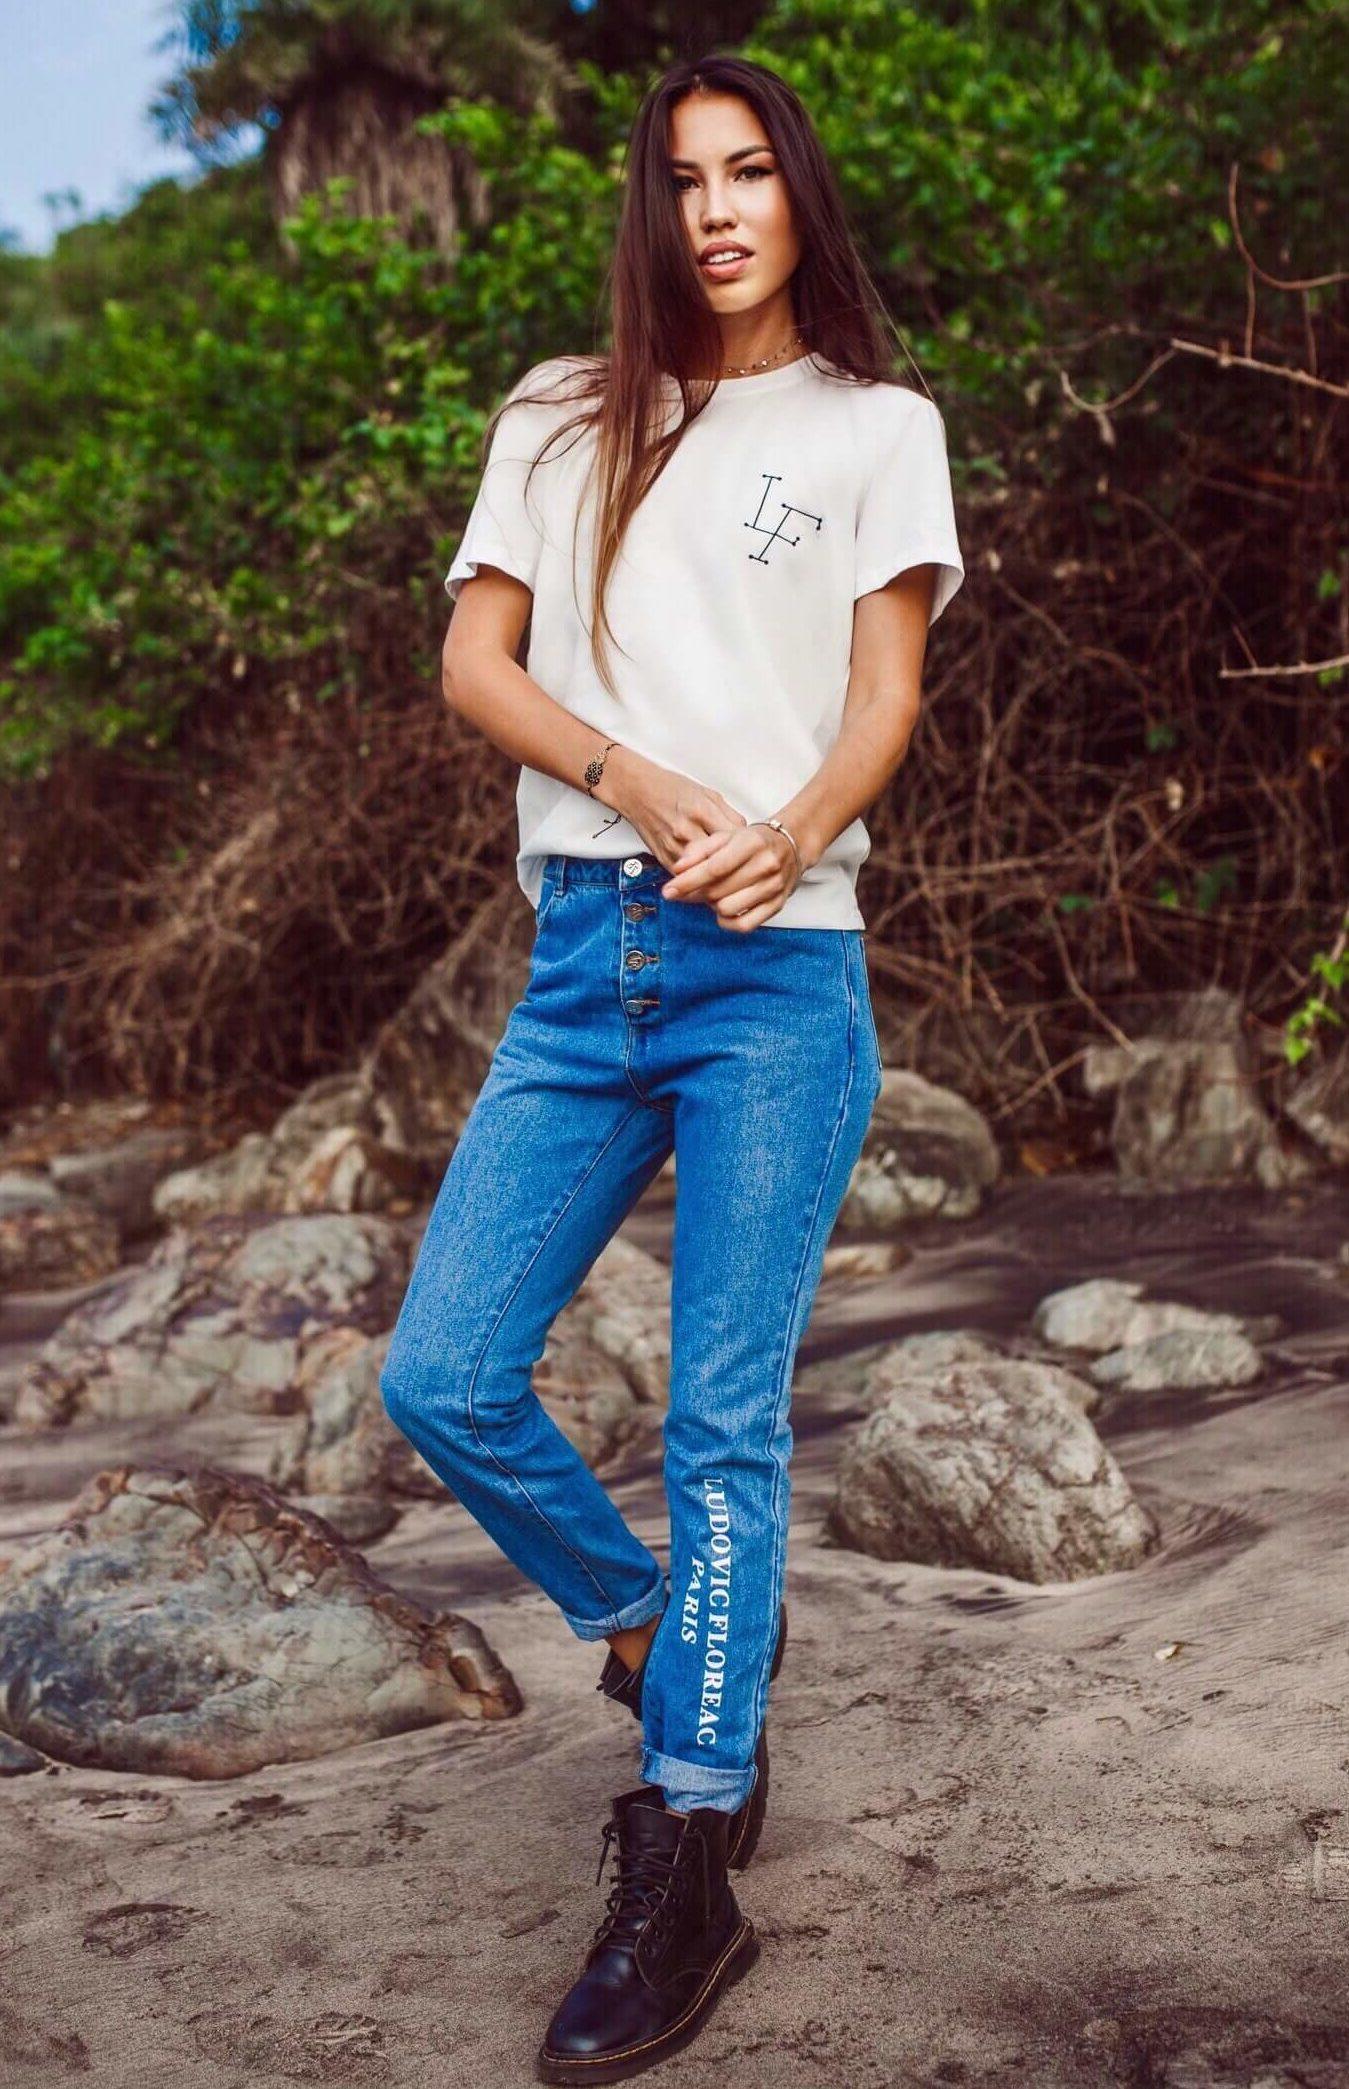 ludovic floreac paris fashion brand women t-shirt and jeans